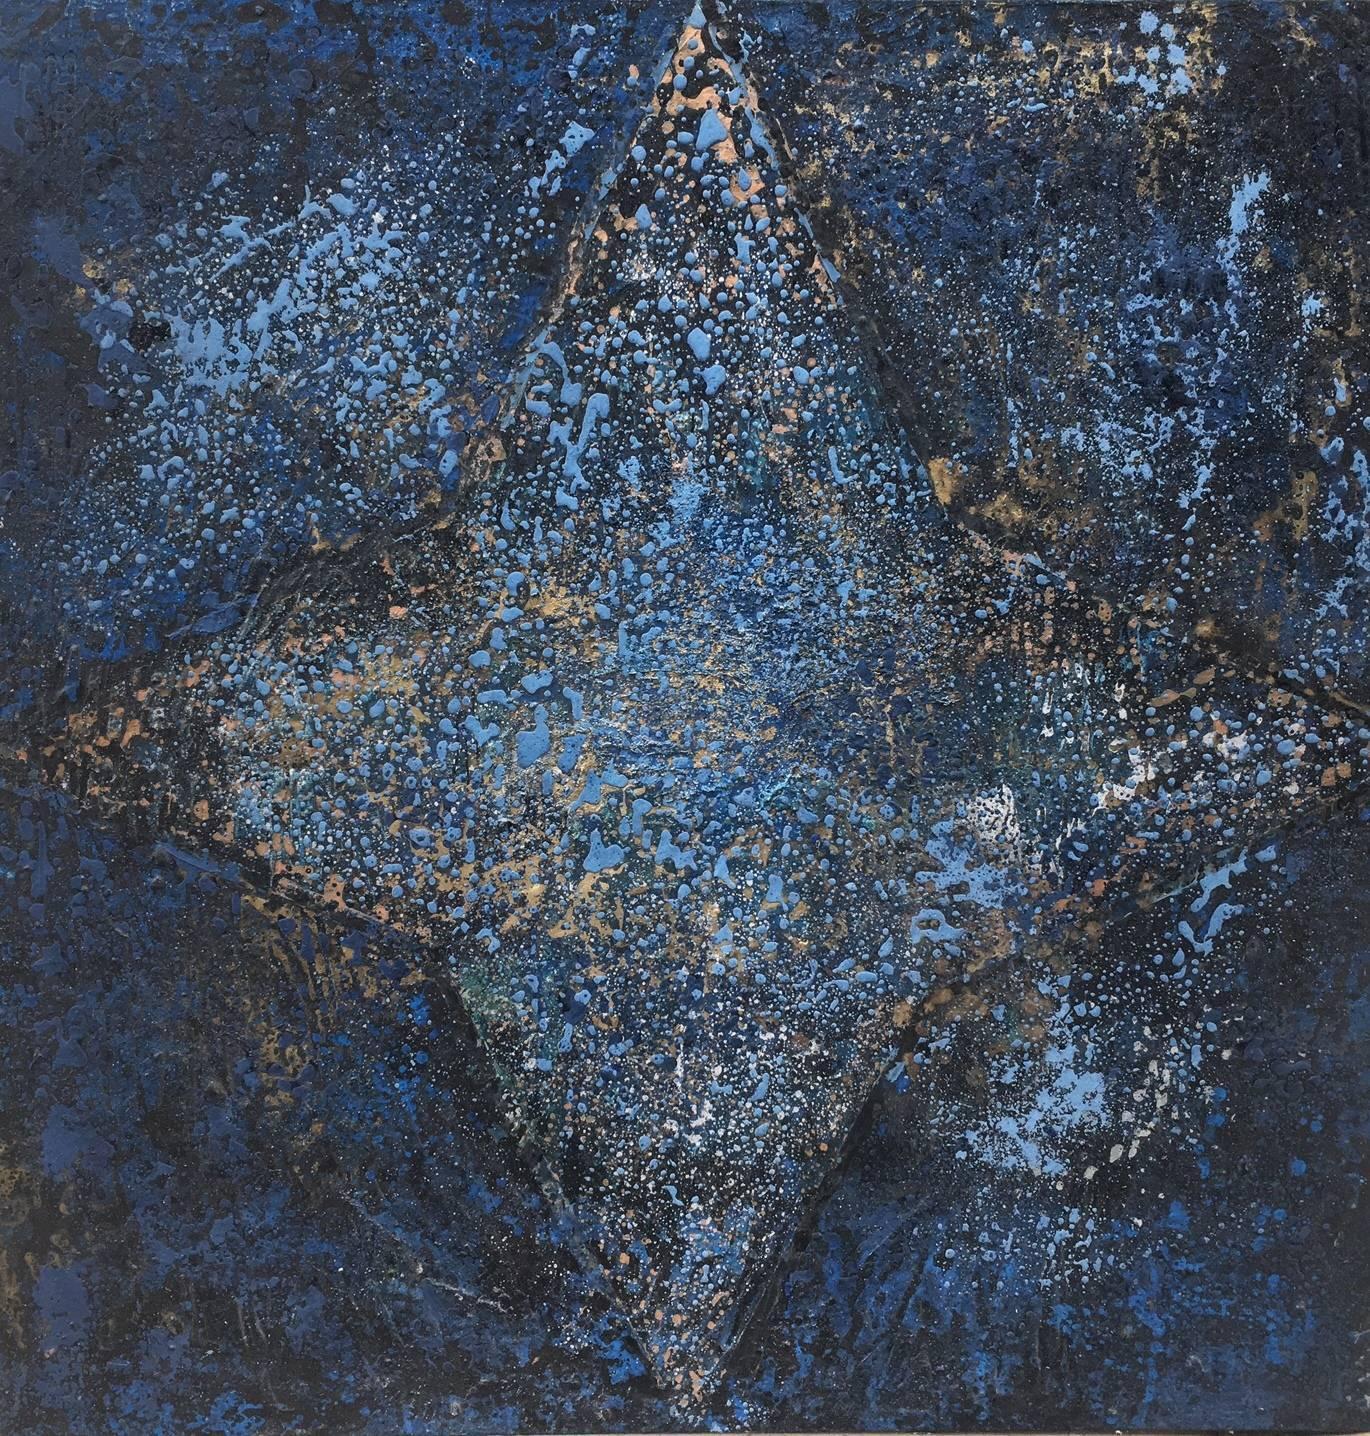 """ STAR BLUE"" original abstract mixed media canvas painting"